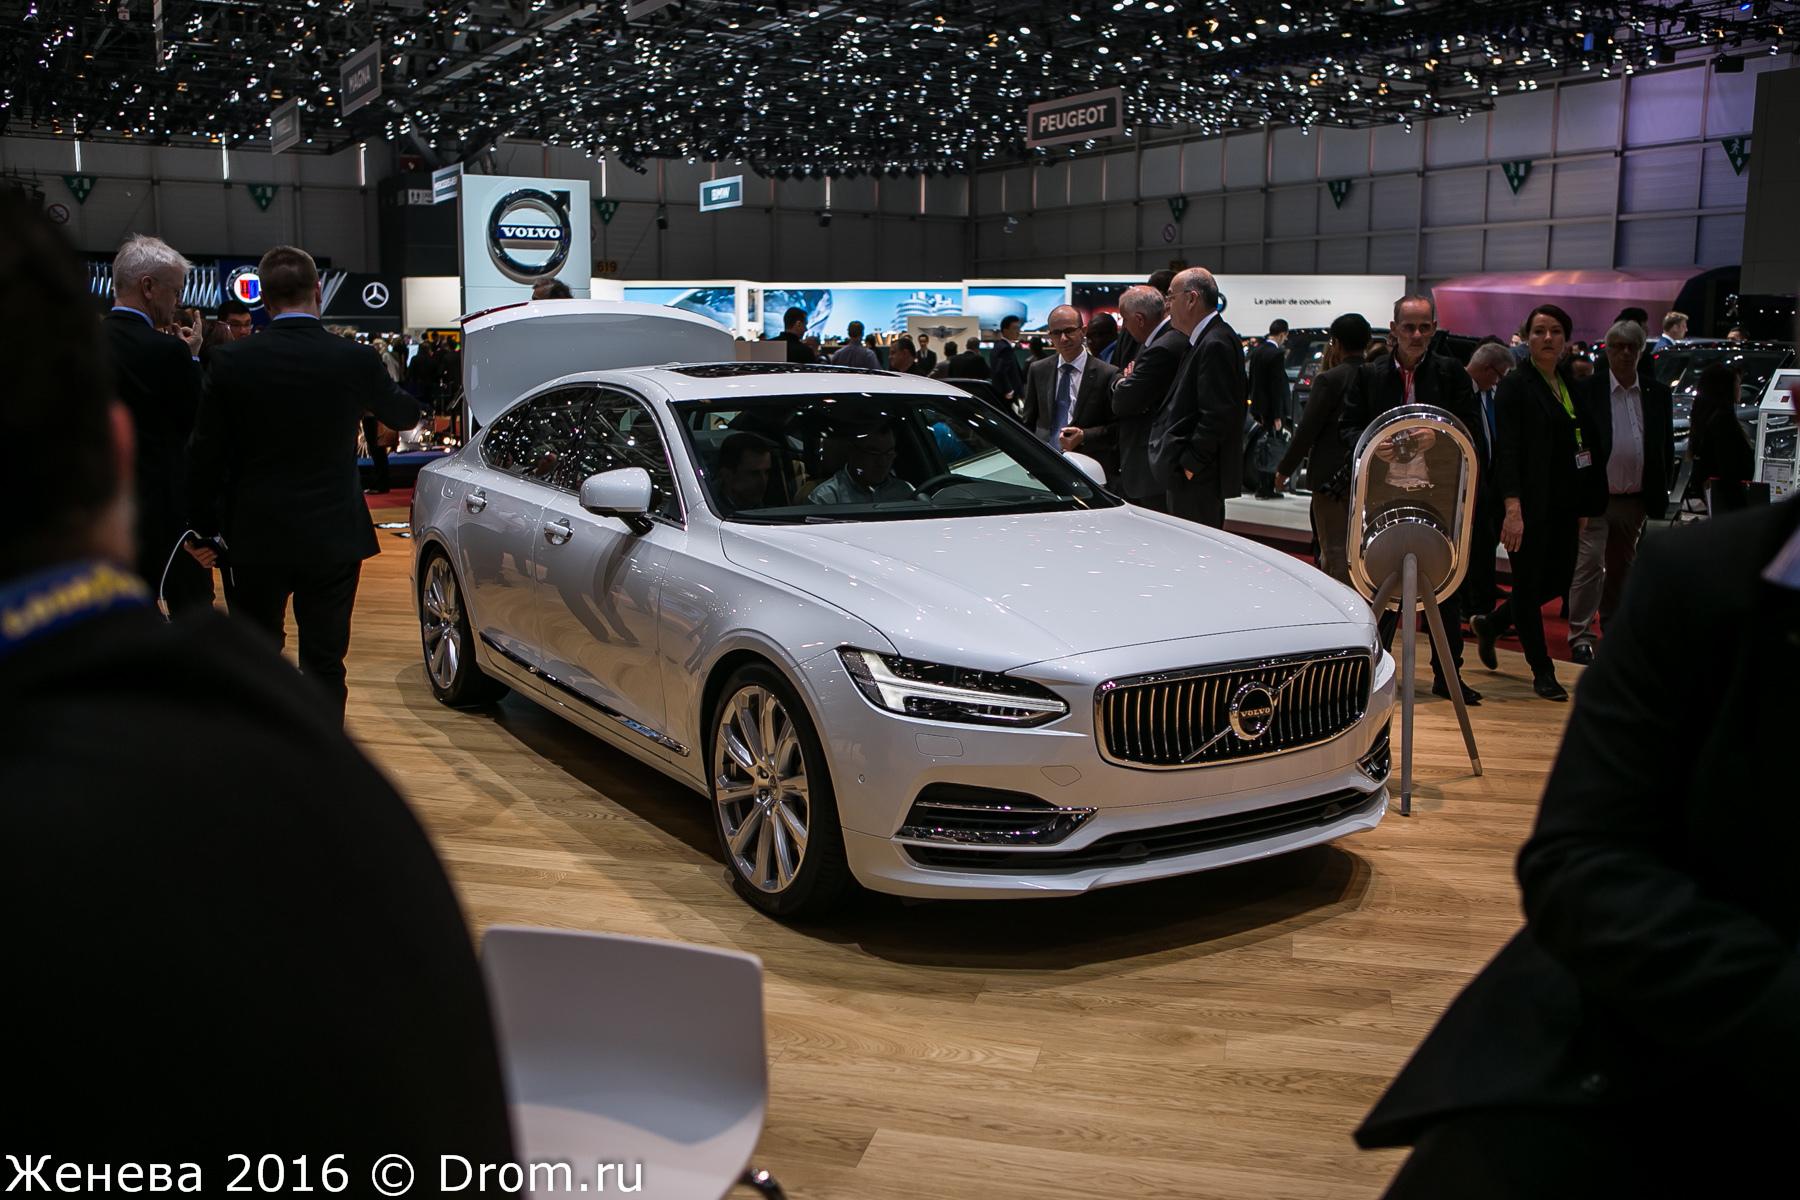 Мир ВоРьво Volvo на Женевском автосаРоне 2016